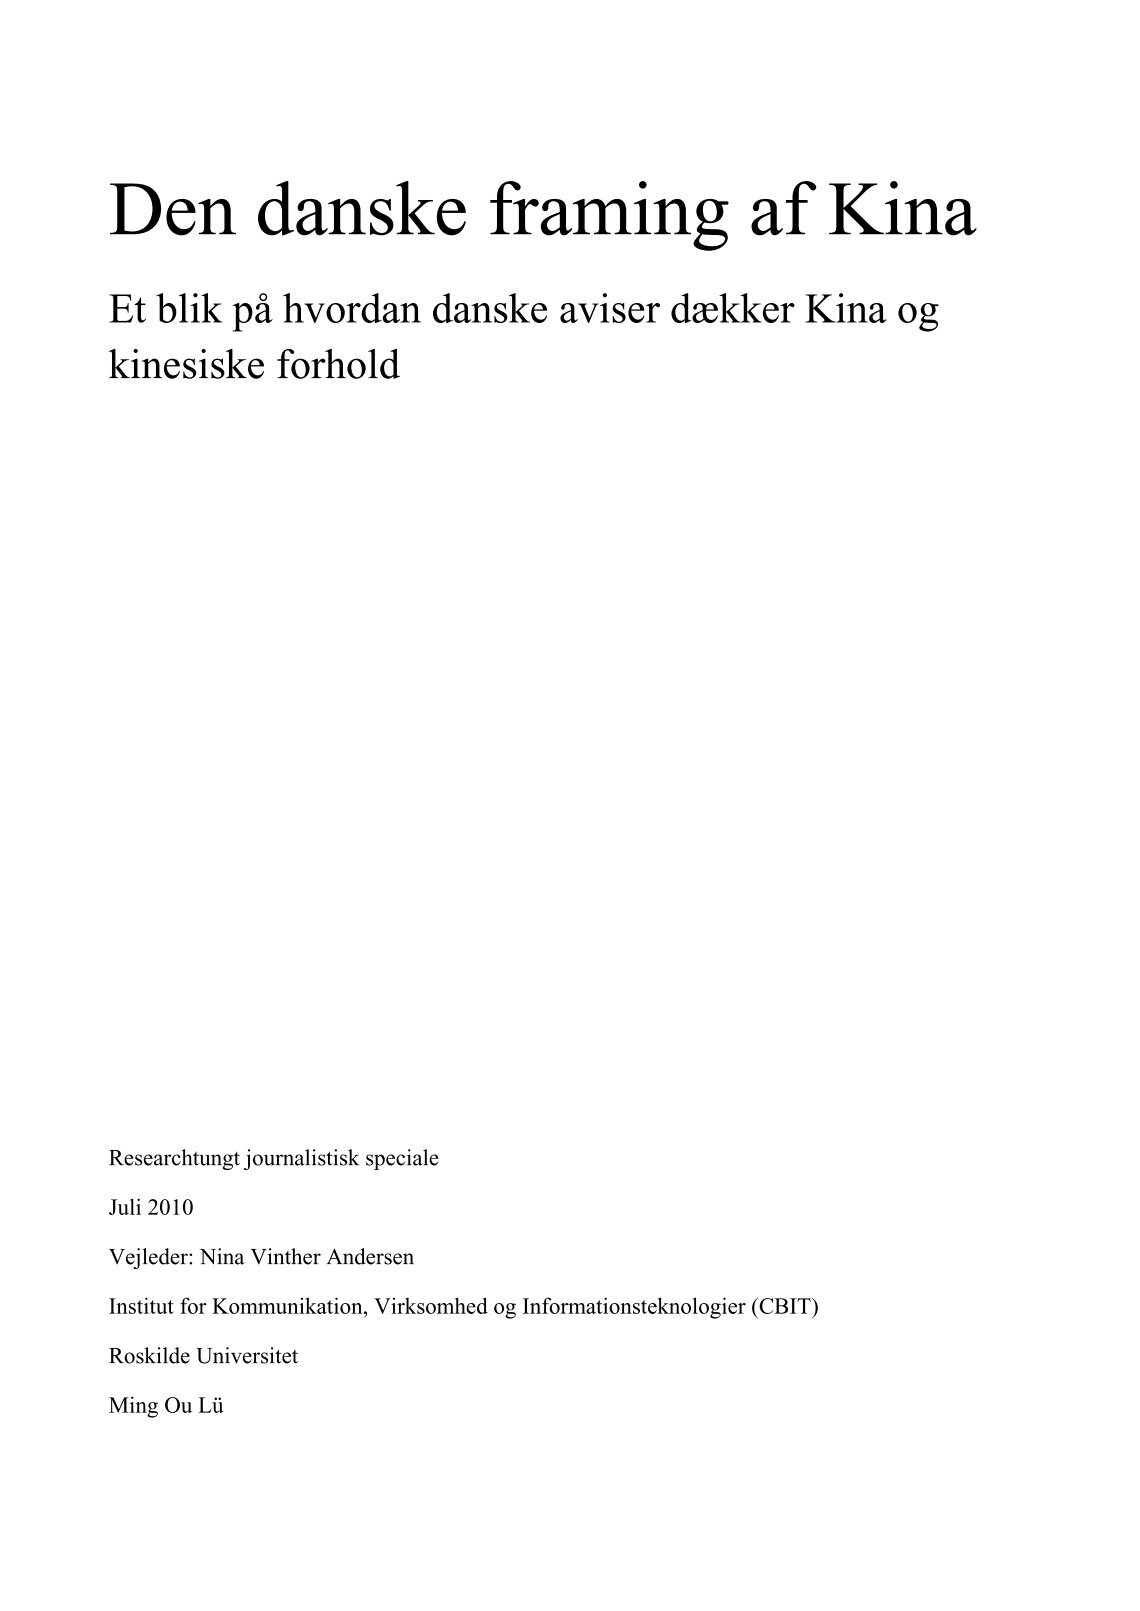 Erfreut Framing Kommunikation Fotos - Rahmen Ideen - markjohnsonshow ...